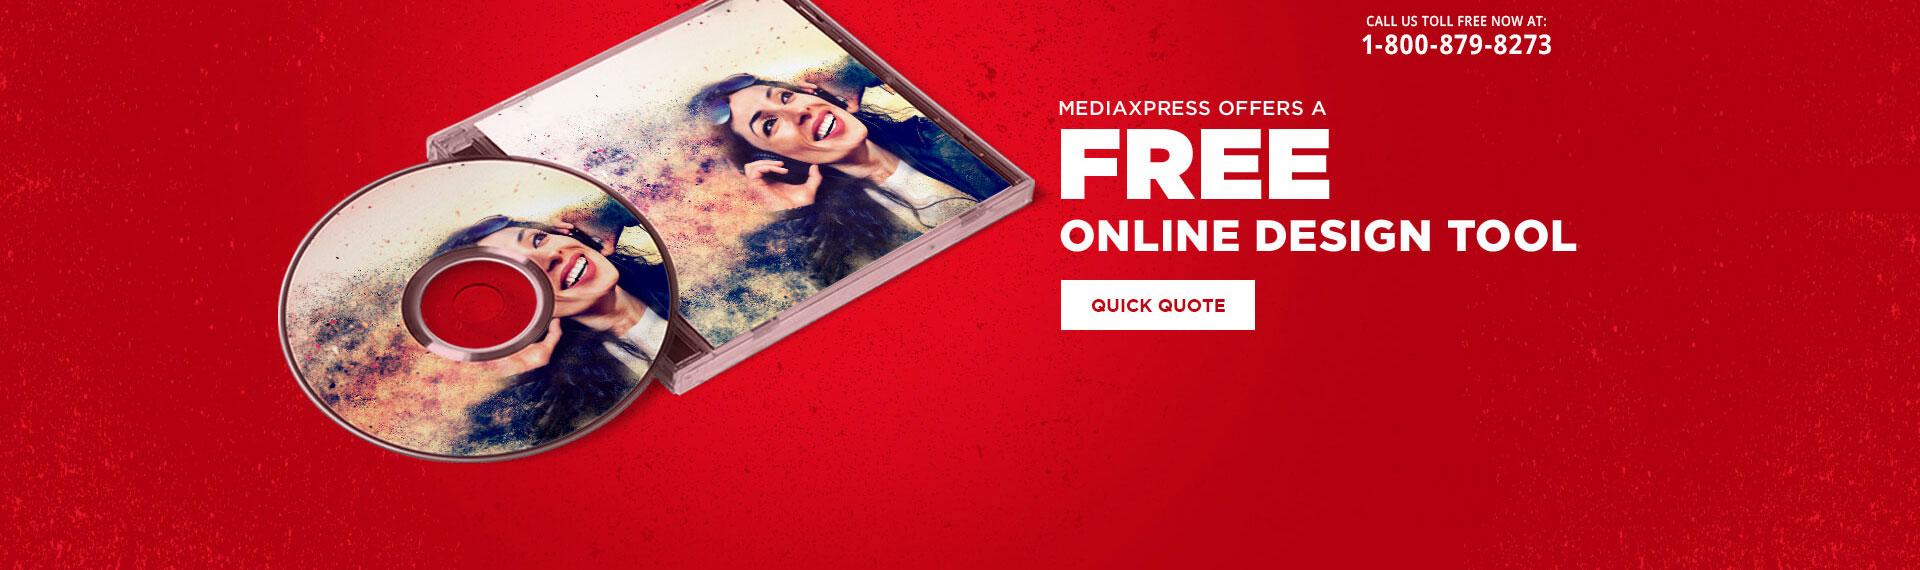 Free Online Design Tool